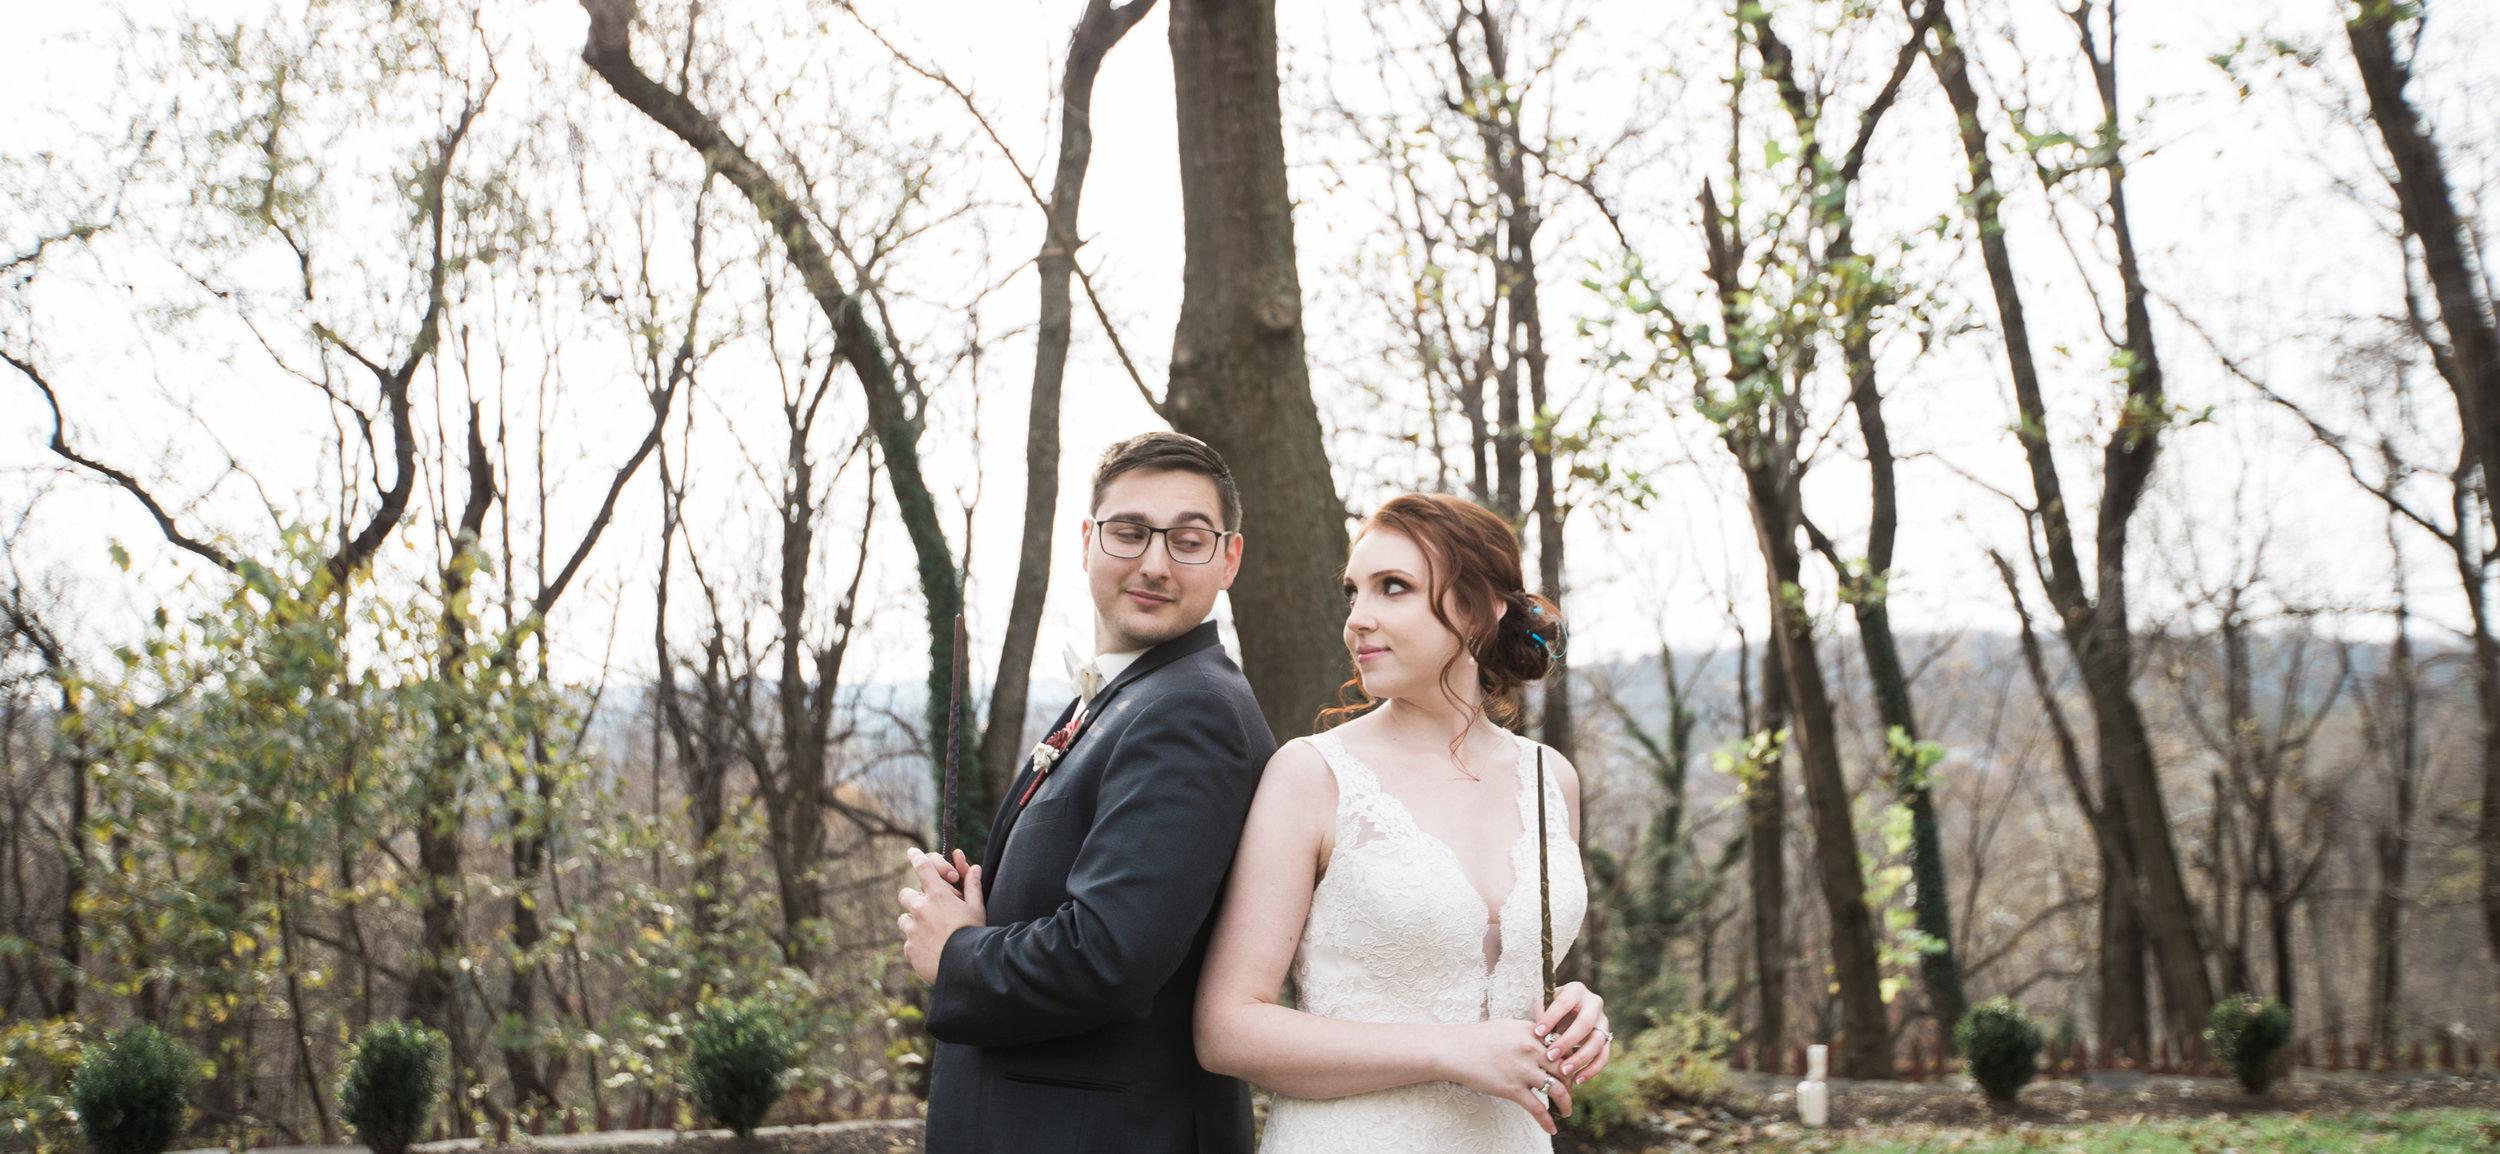 Harry Potter Wedding at Overhills Mansion Catonville Maryland Wedding Photographers Megapixels Media (56 of 134).jpg